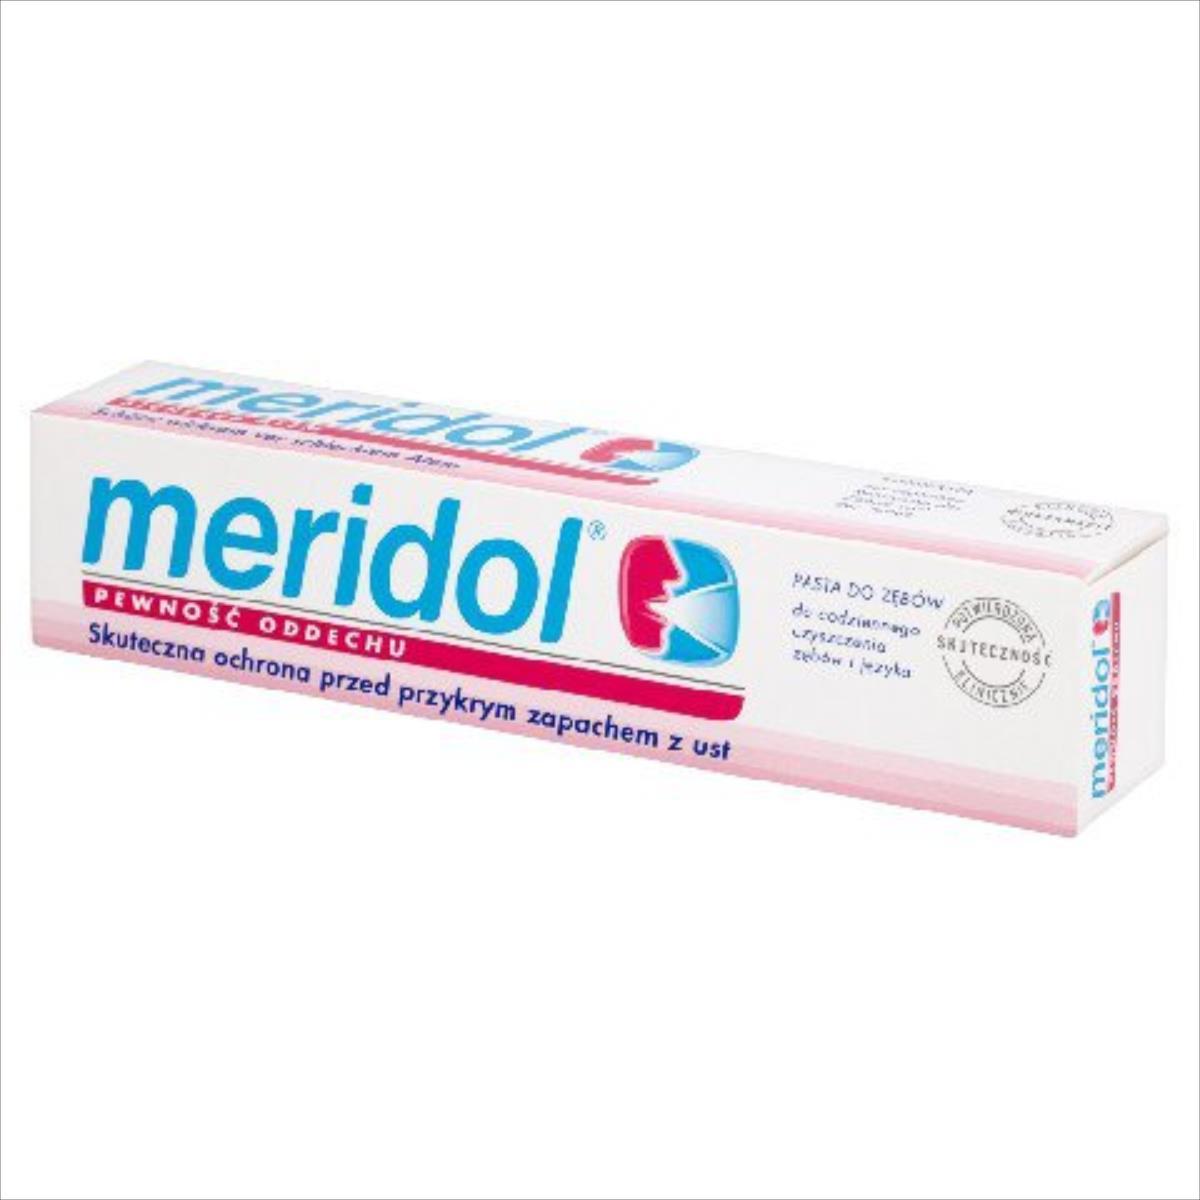 Meridol  Halitosis 75 ml - 177987 mutes higiēnai